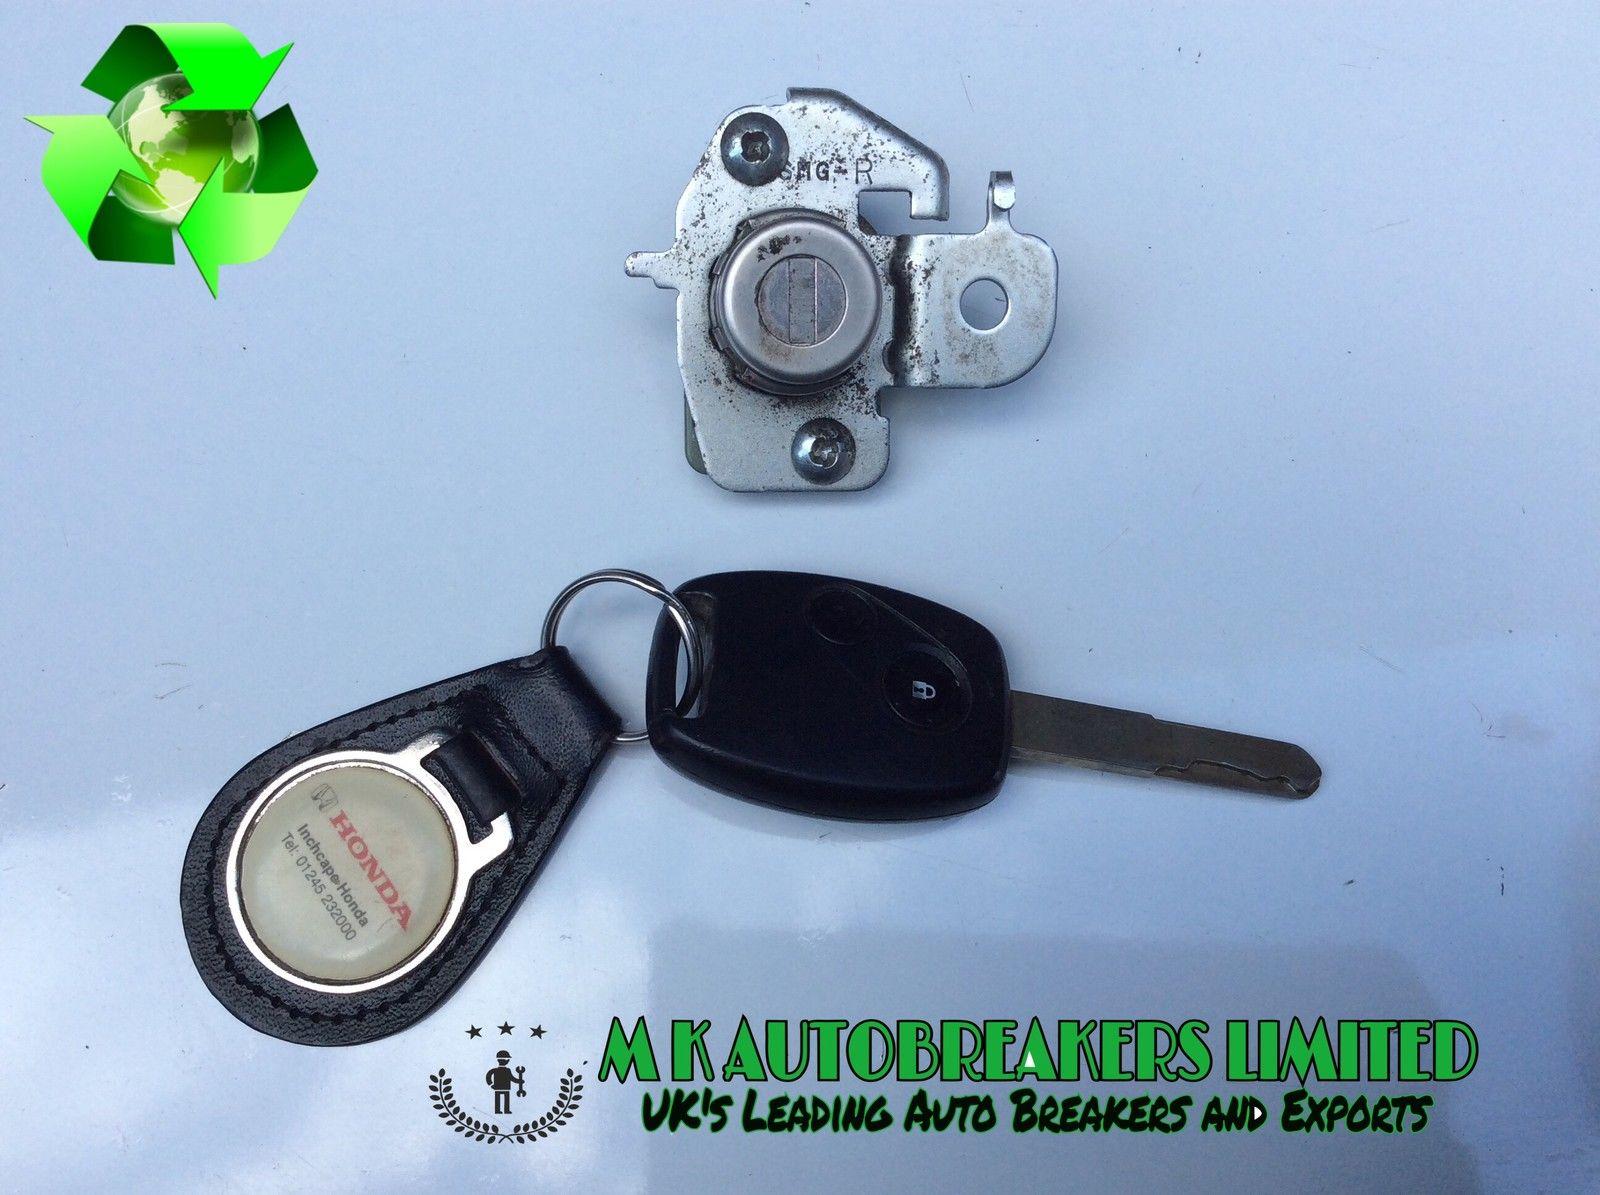 Honda Civic MK8 From 06-11 Complete ECU Kit With Key Barel